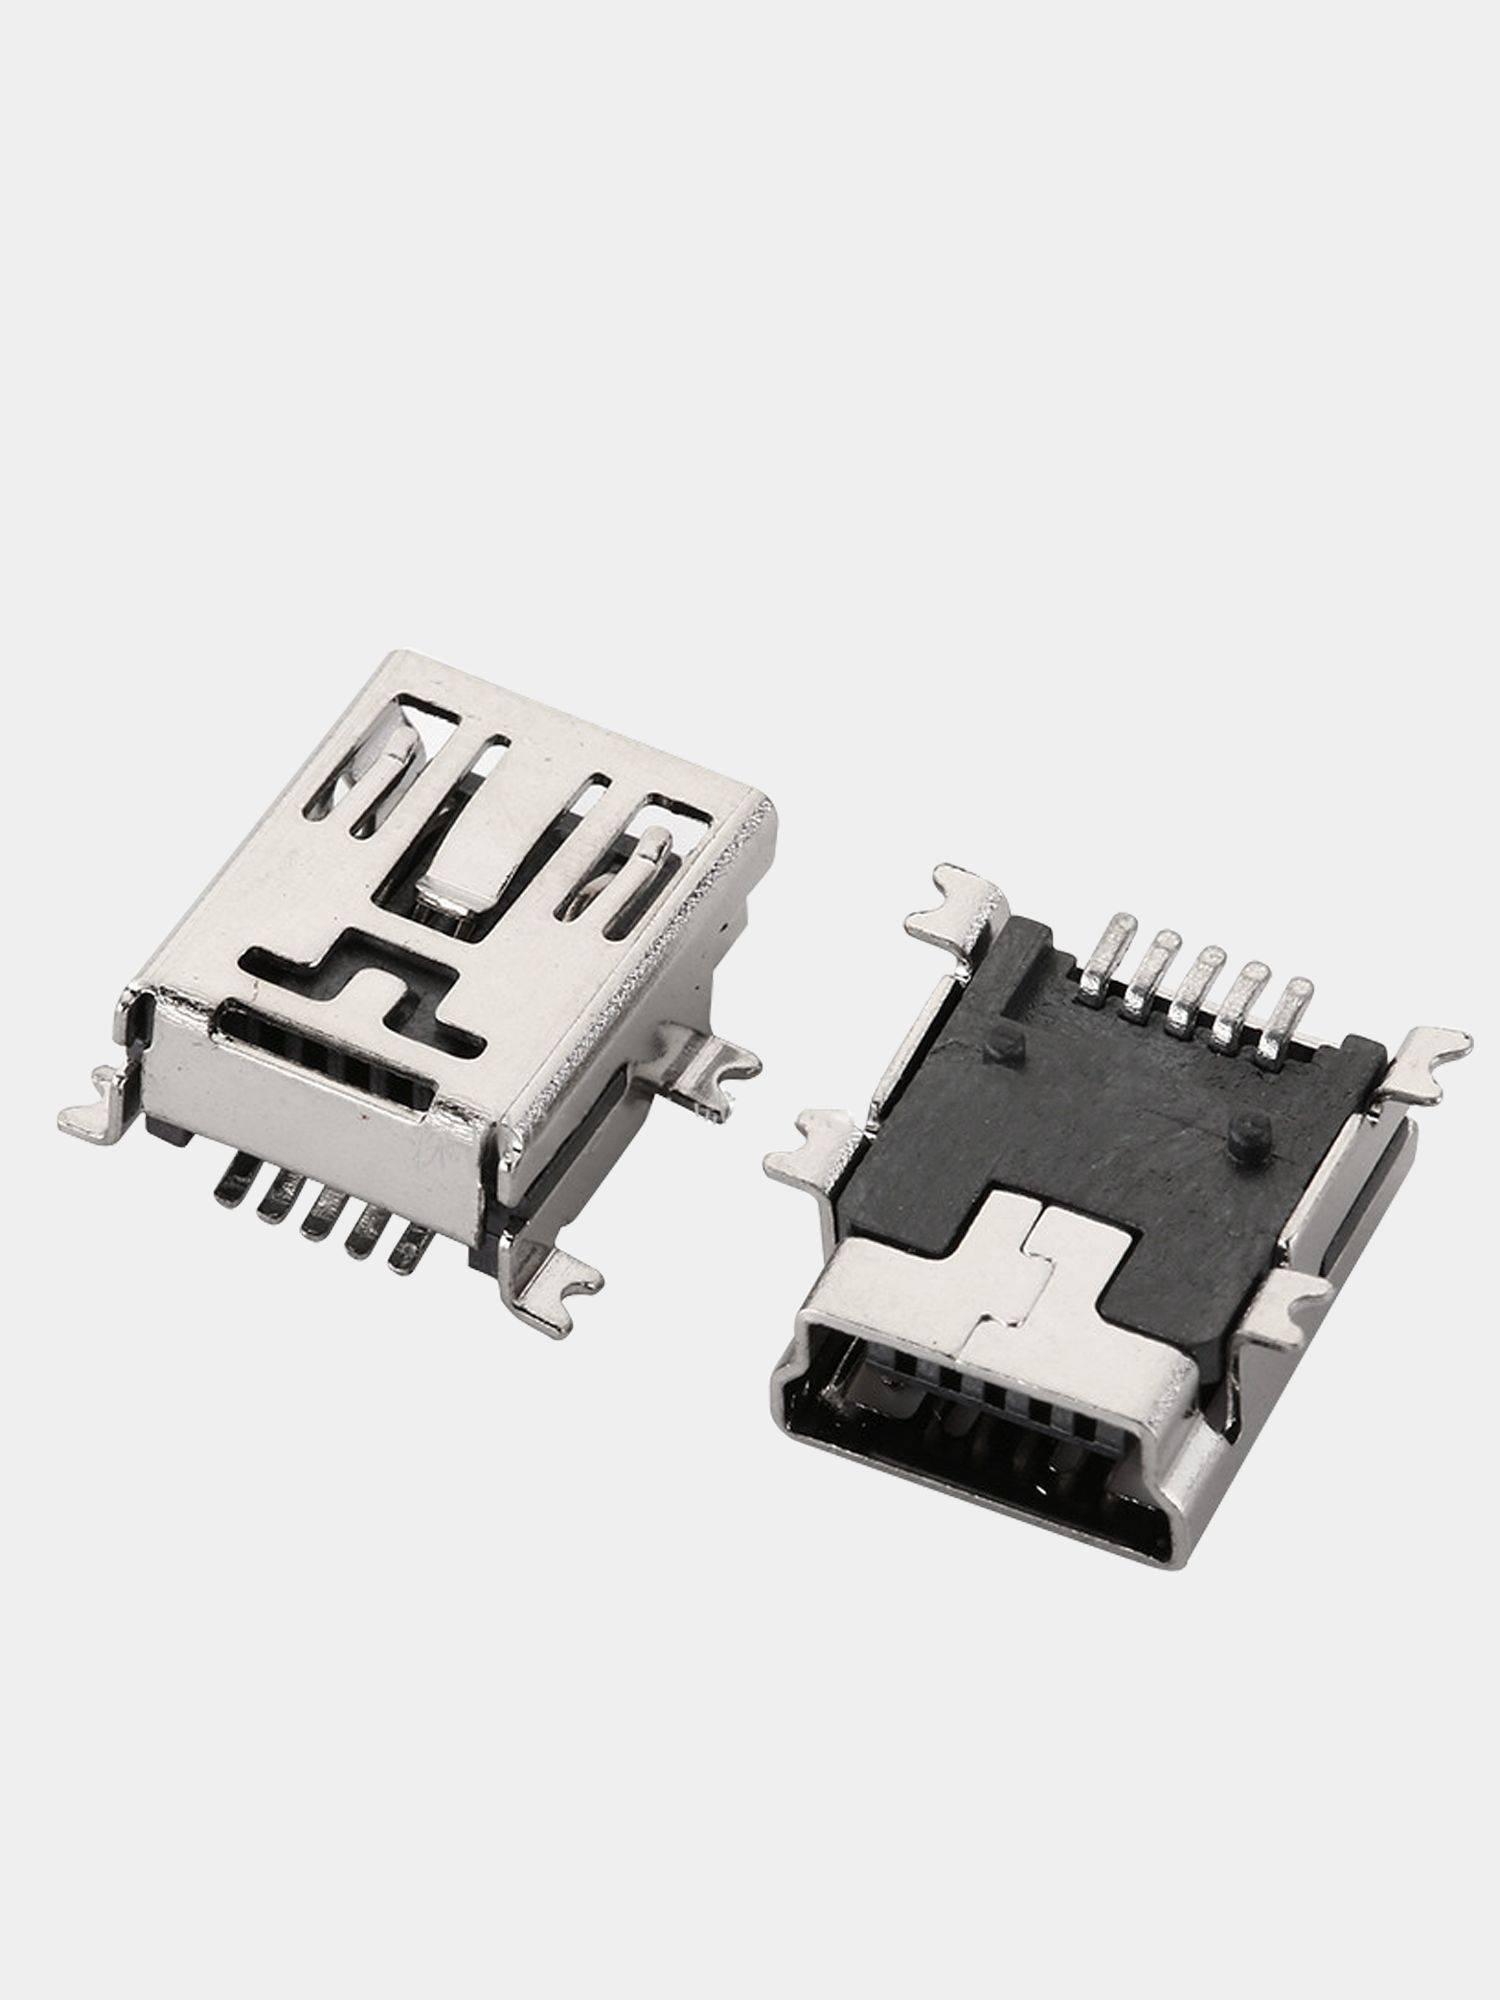 Разъем Mini USB-5P с доставкой за 1 день купить на KazanExpress